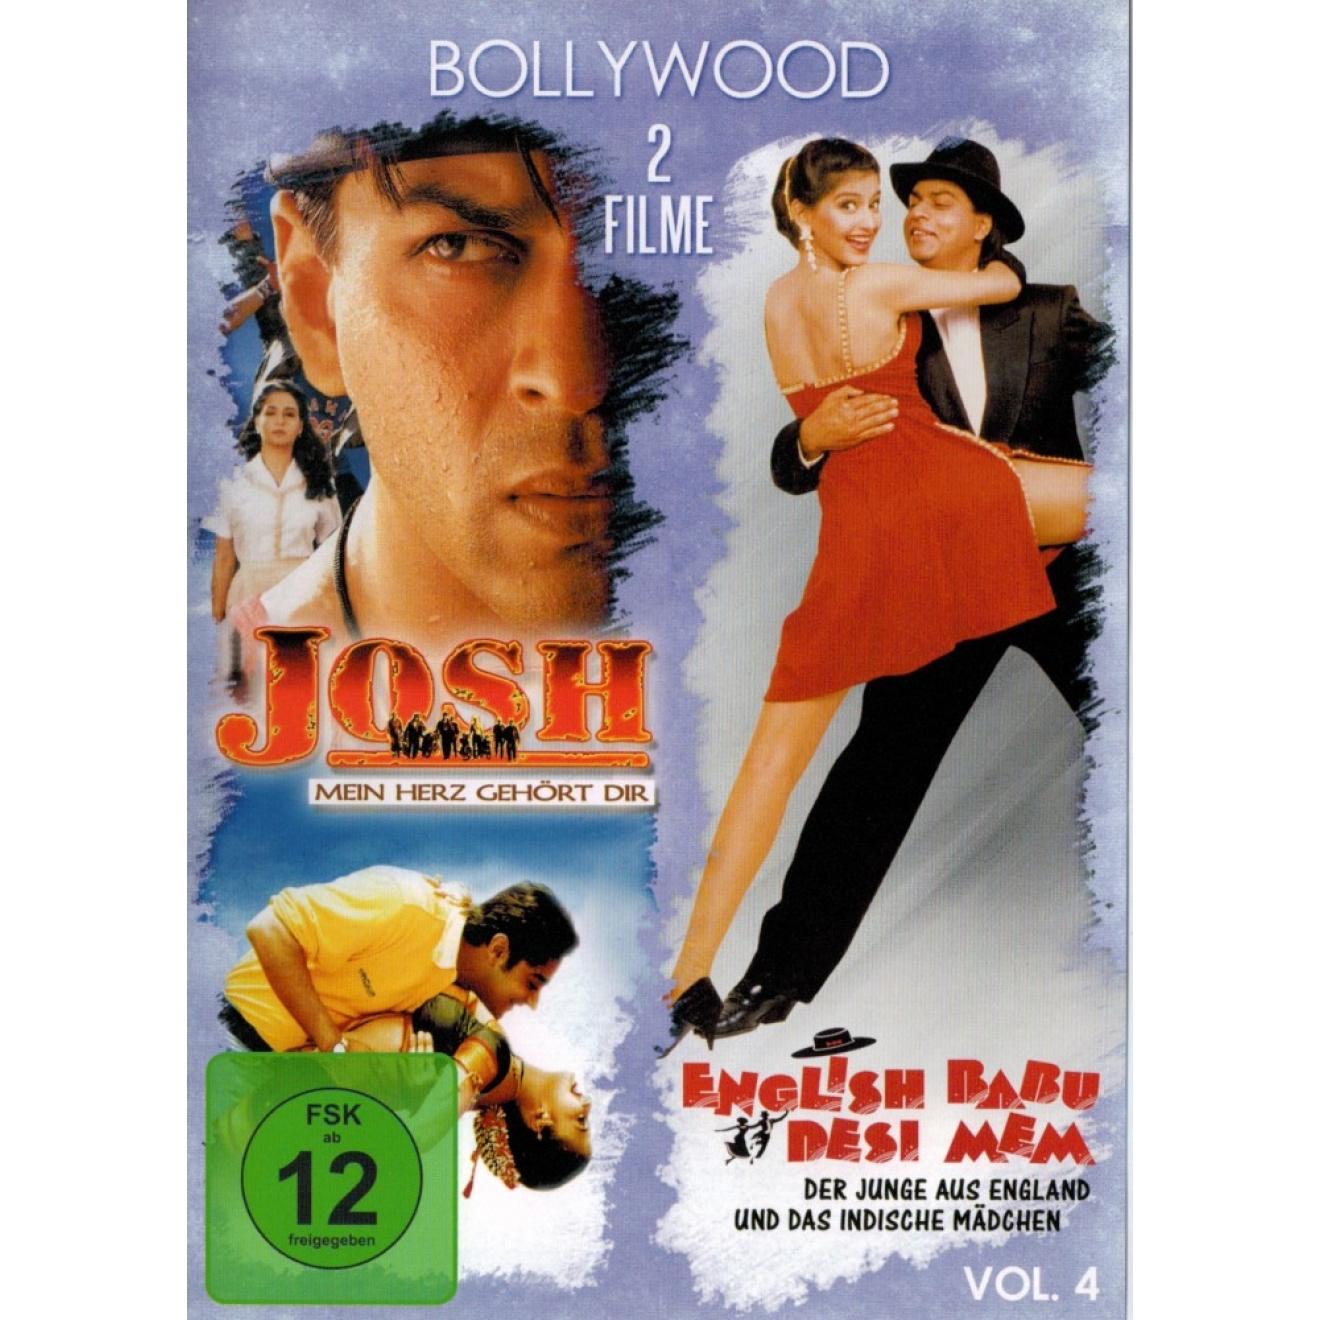 Bollywood 2 Filme Mit Shahrukh Khan Vol 4